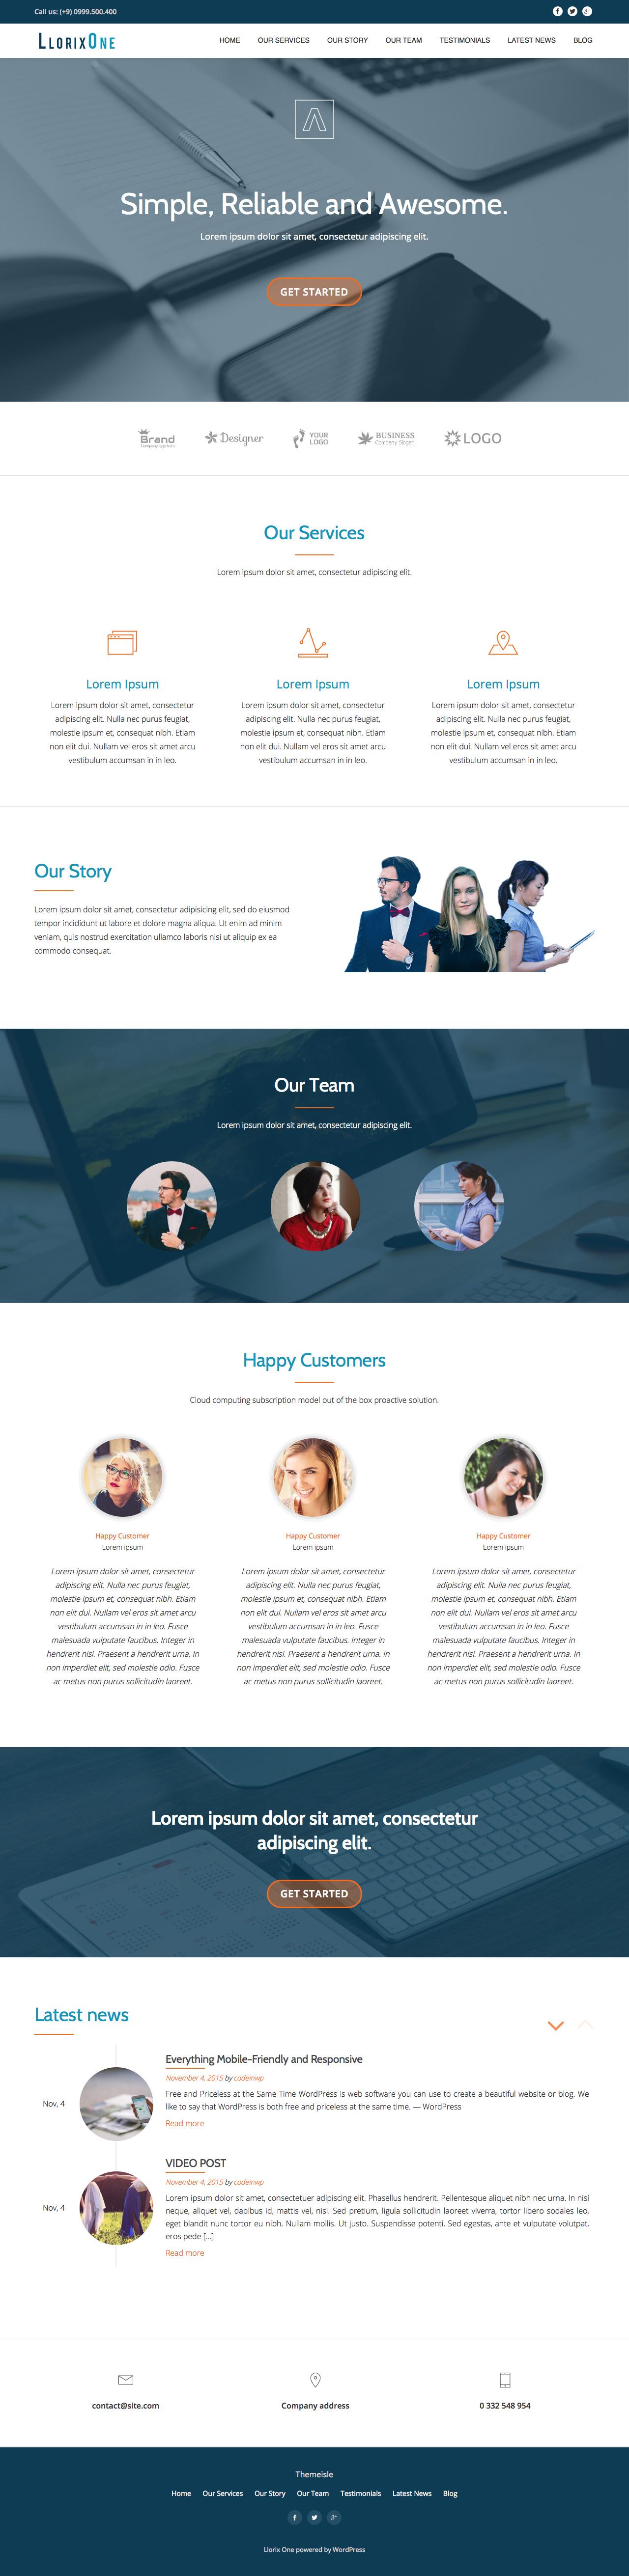 Llorix One Website Screenshot